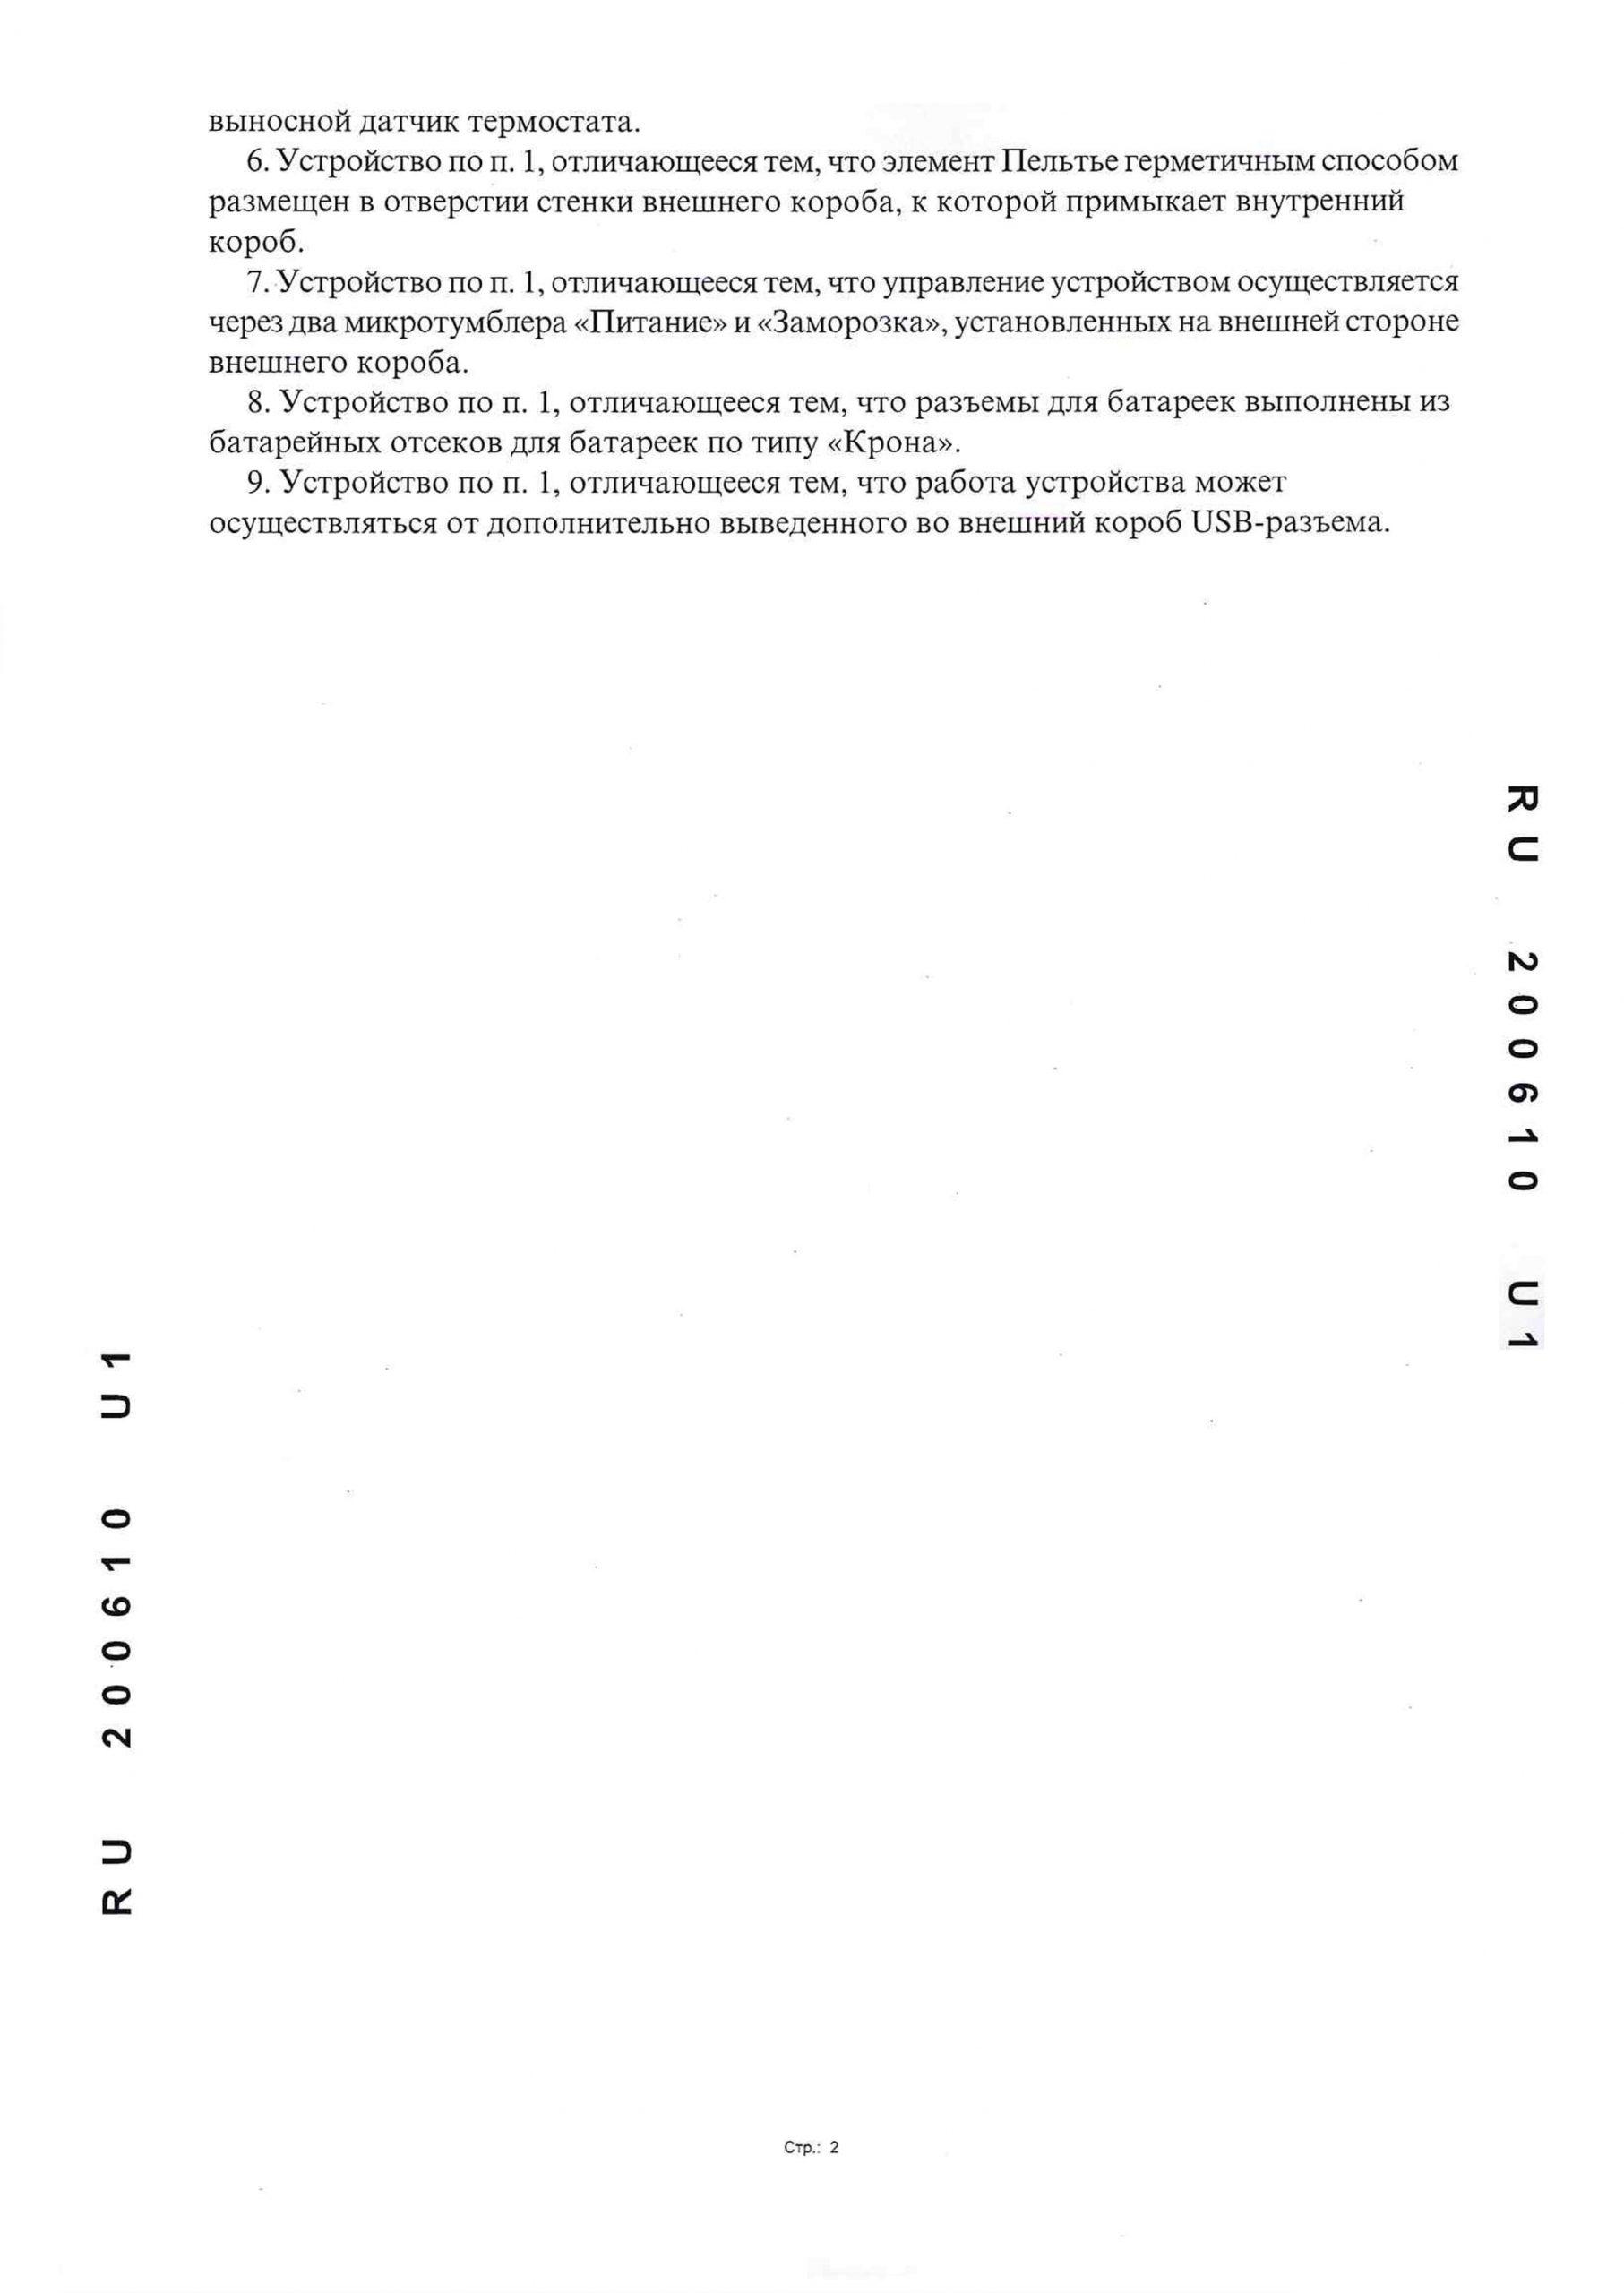 ПатентПМ — 0004